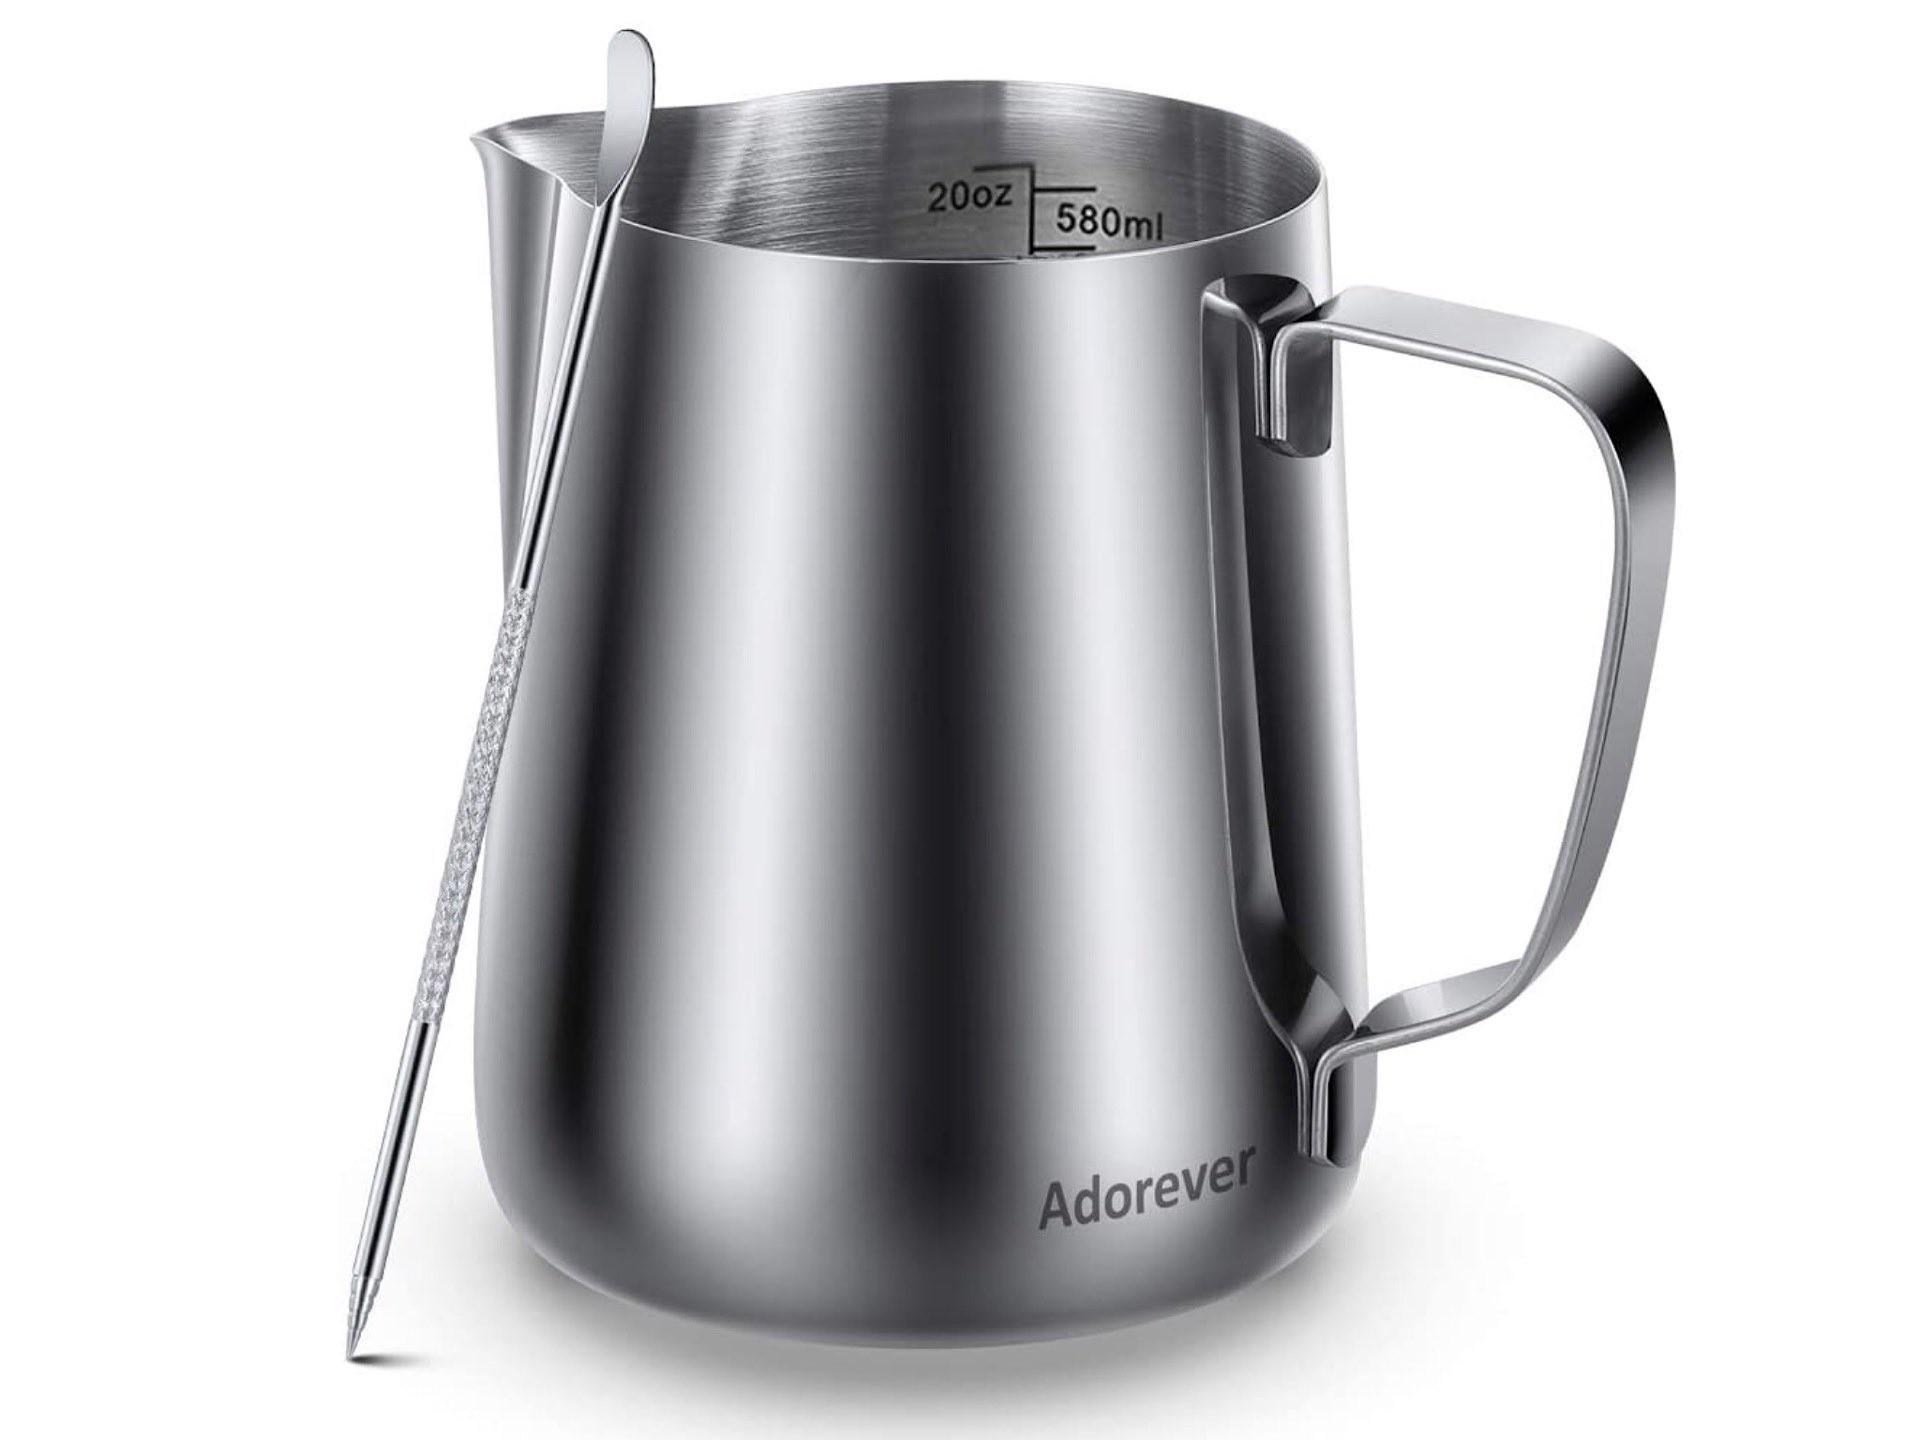 adorever-milk-steaming-pitcher